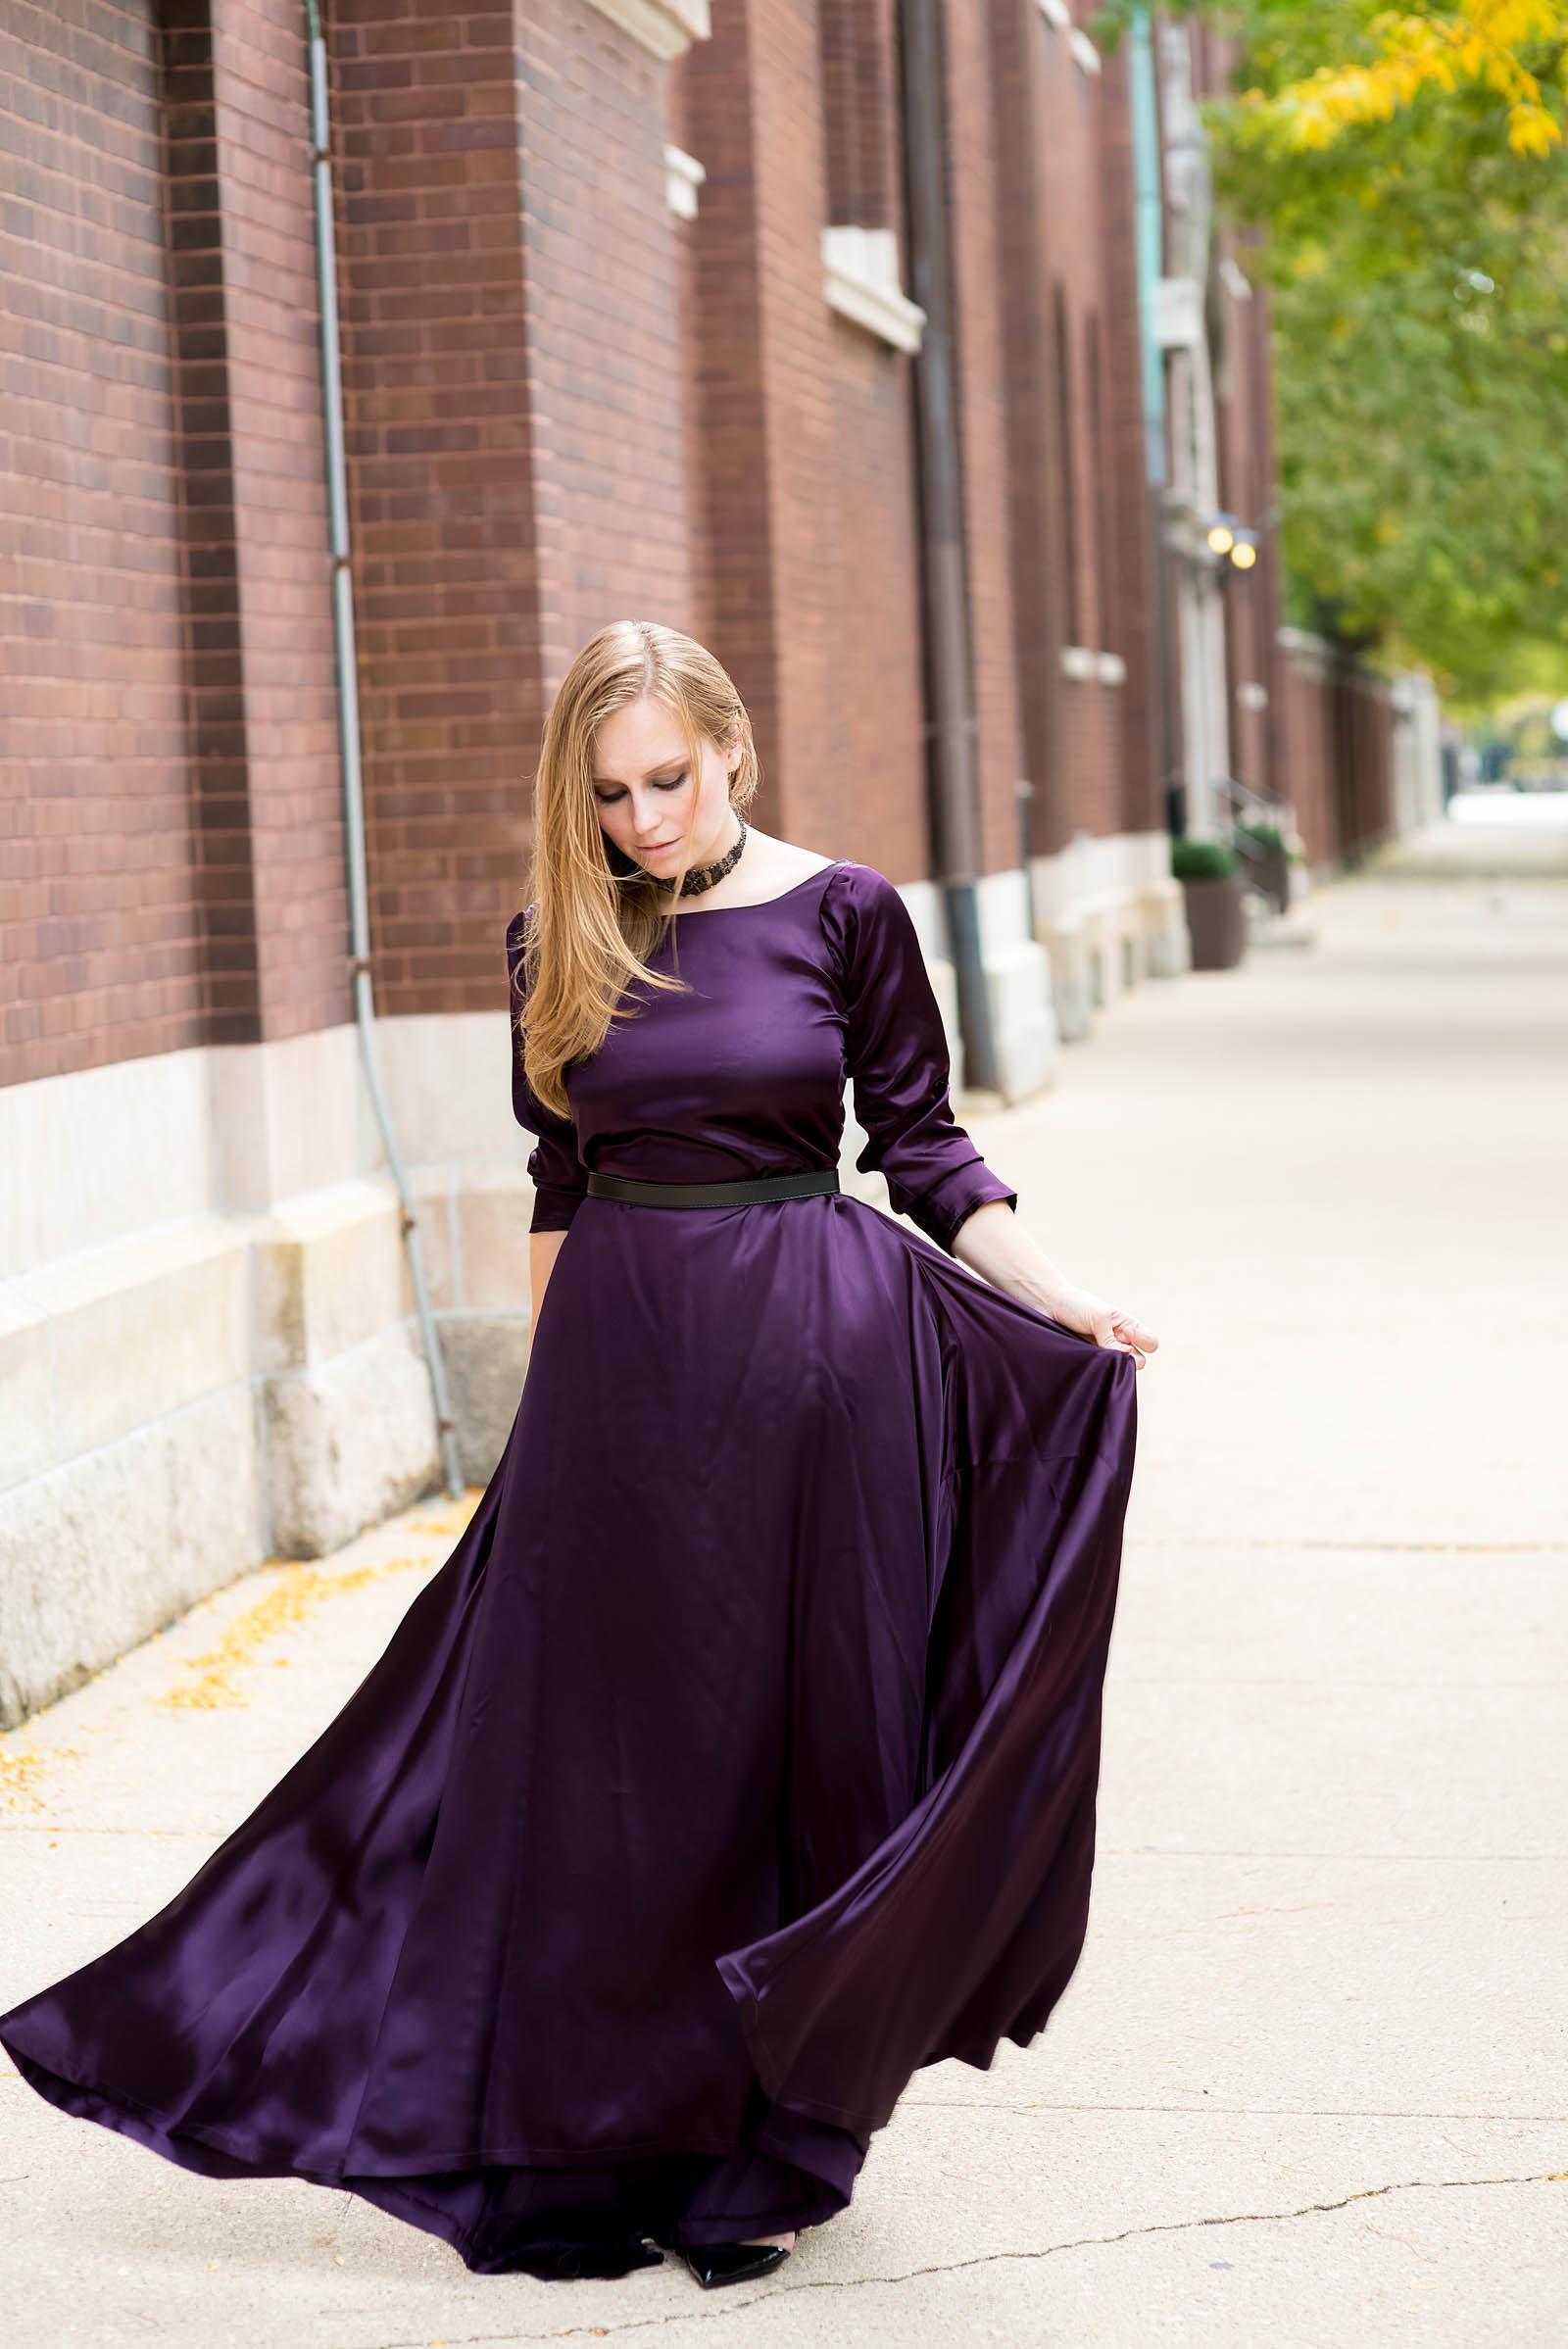 Queen Mab Shakespeare Halloween Costume